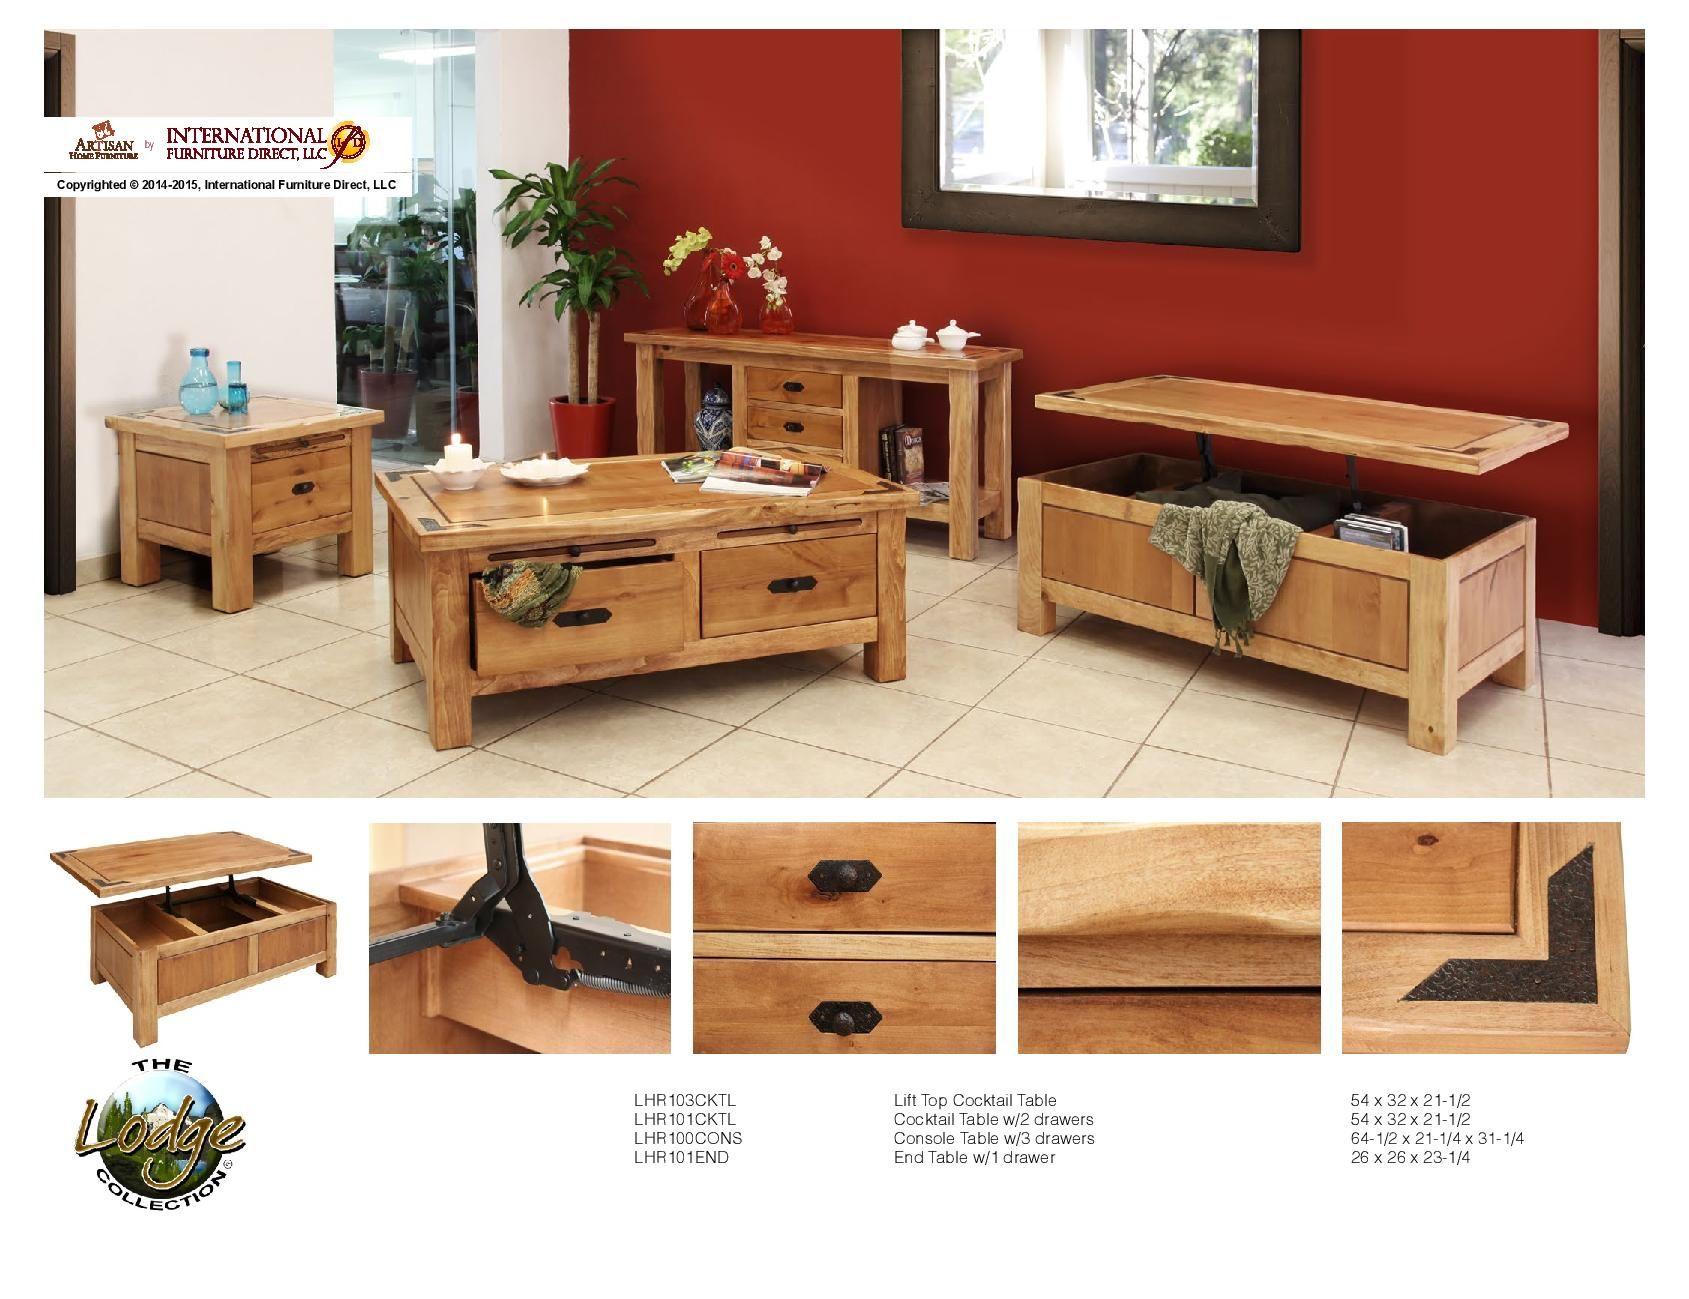 International Furniture Direct Lodge Horizonfurniturestore Com Furniture Direct Furniture Decor